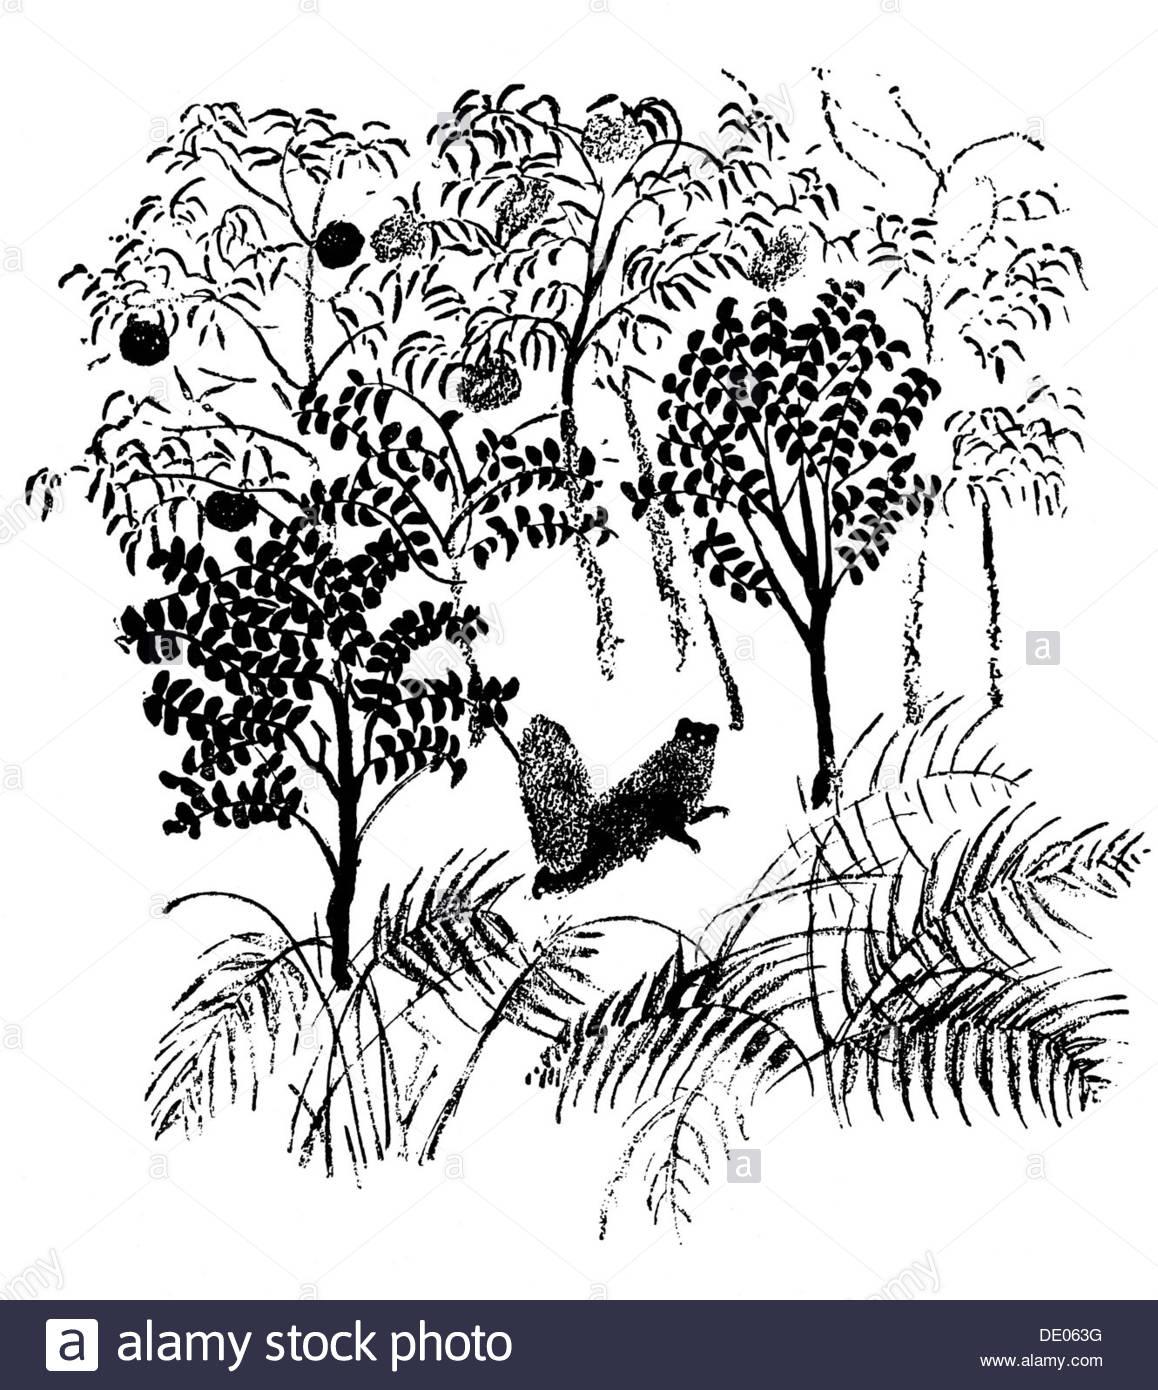 illustration from the book rikki tikki tavi by rudyard kipling 1934